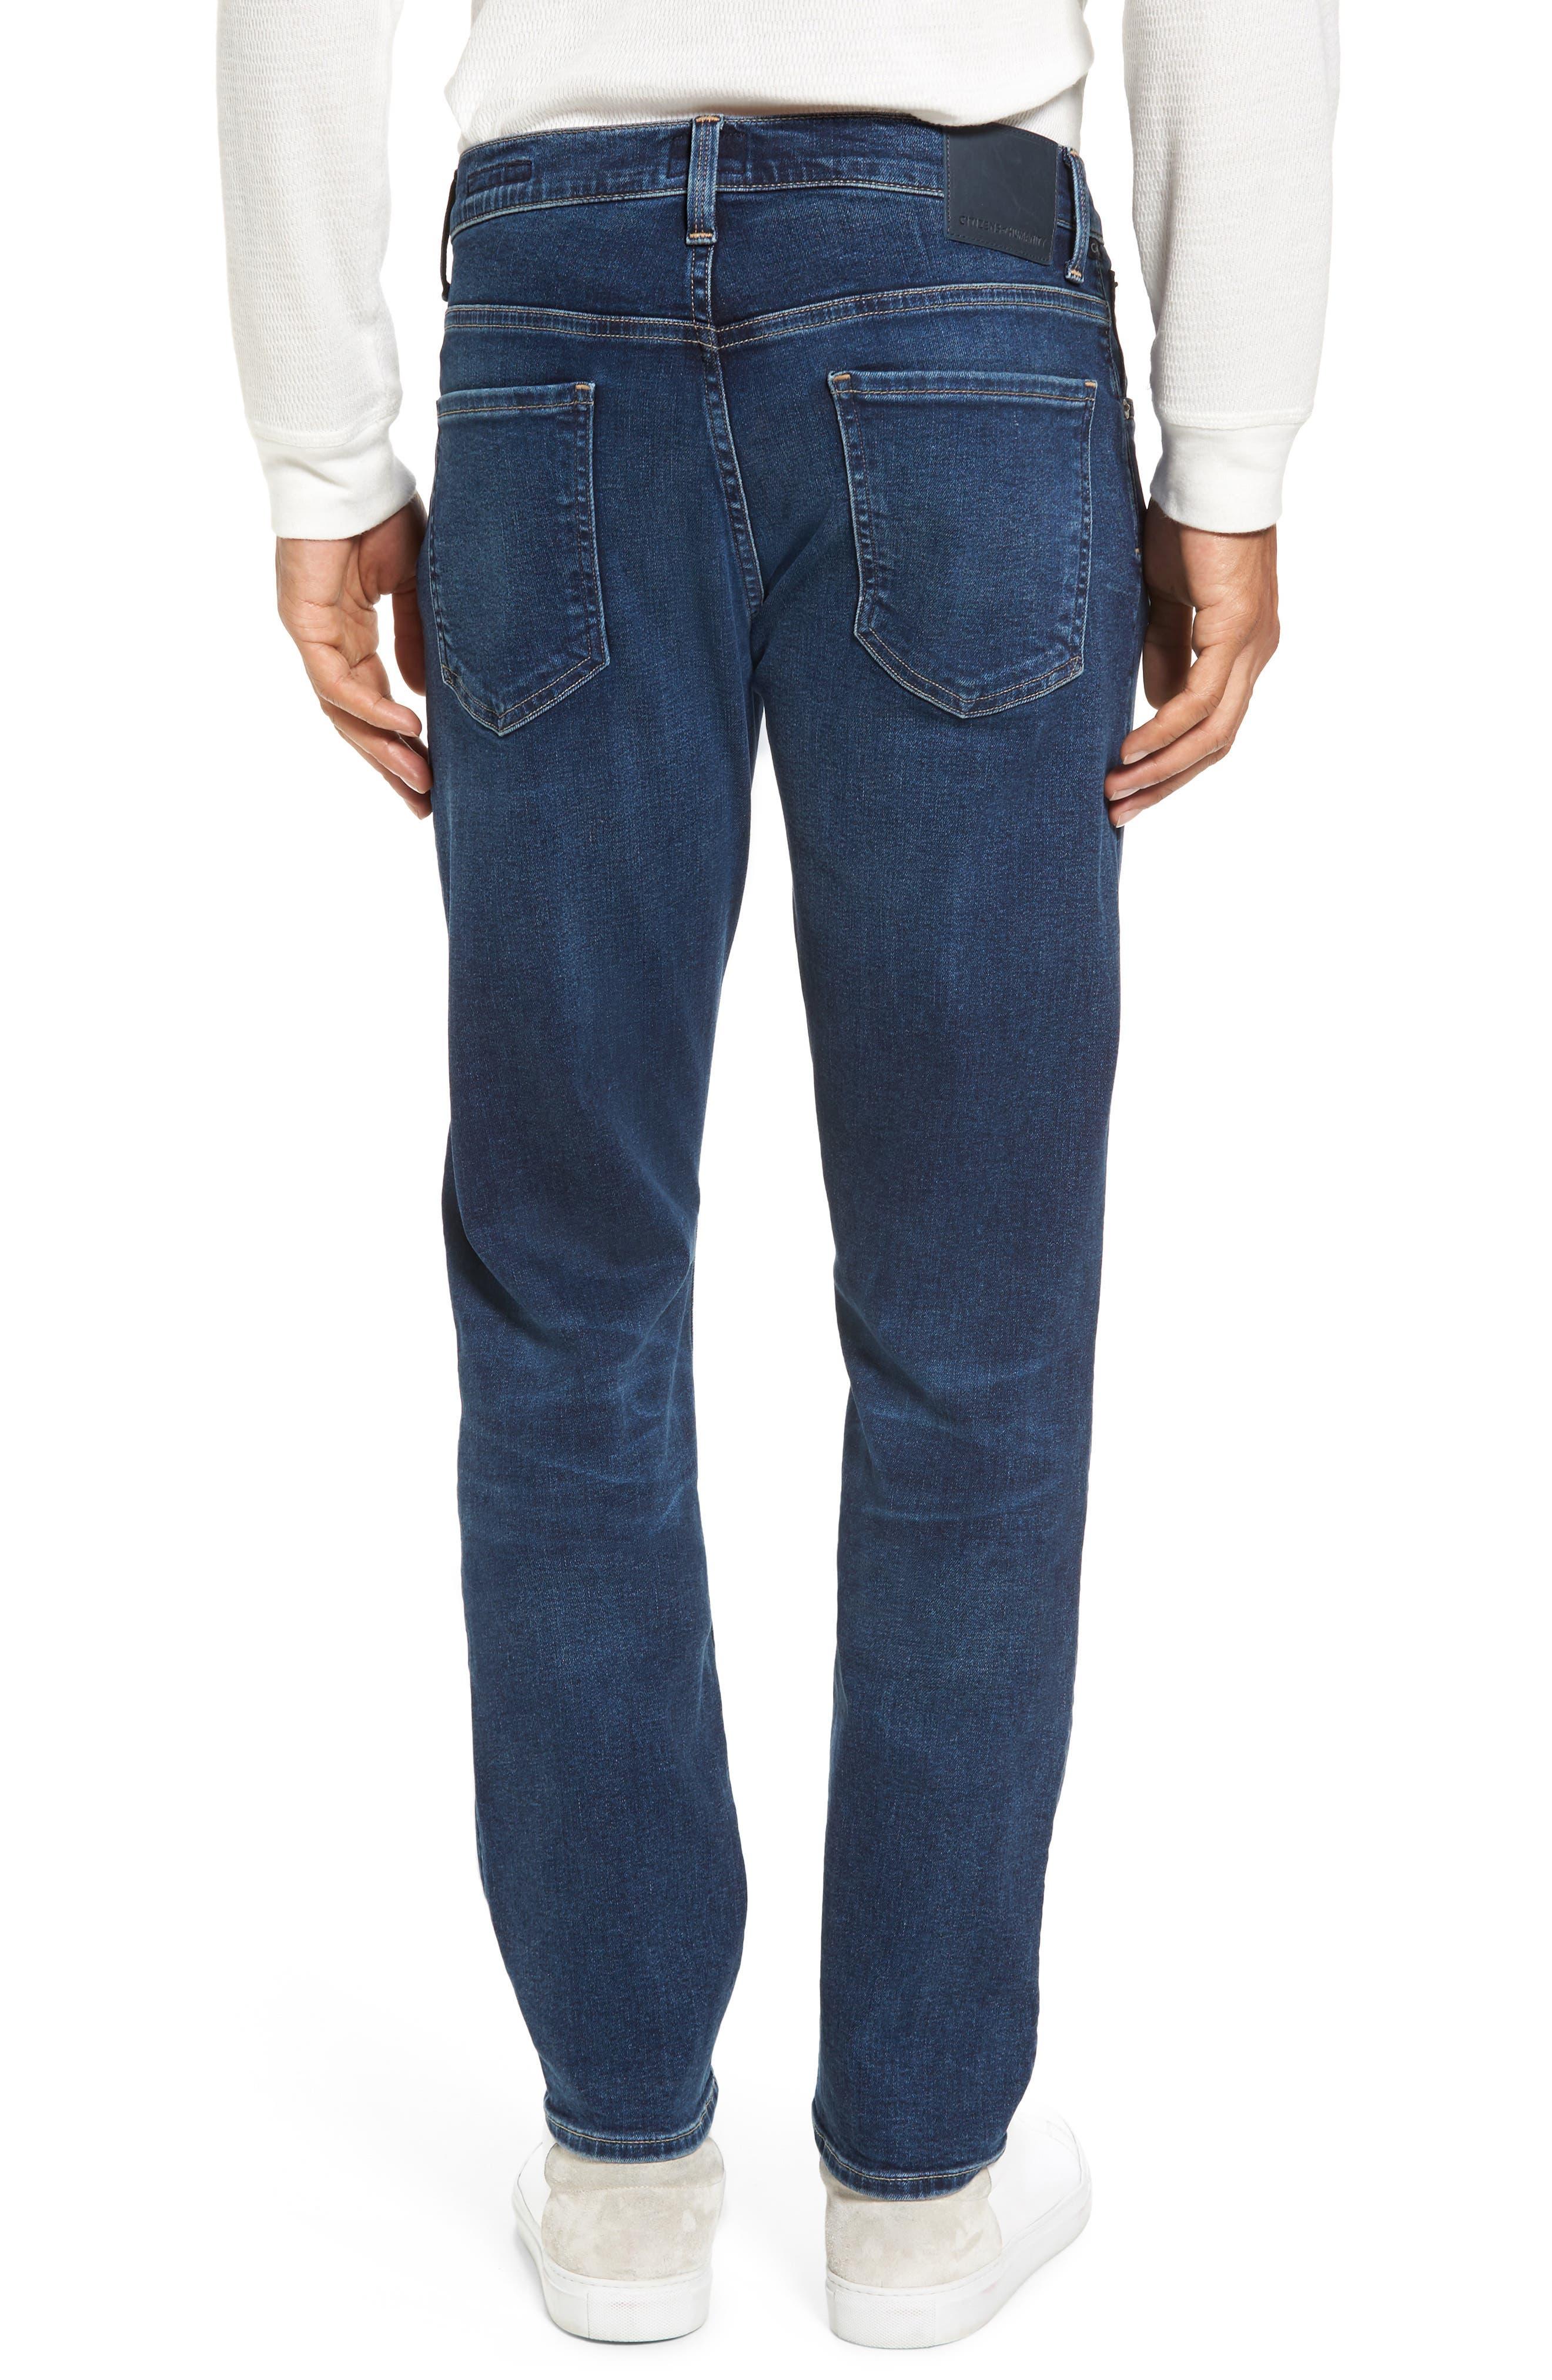 PERFORM - Gage Slim Straight Leg Jeans,                             Alternate thumbnail 2, color,                             Turner